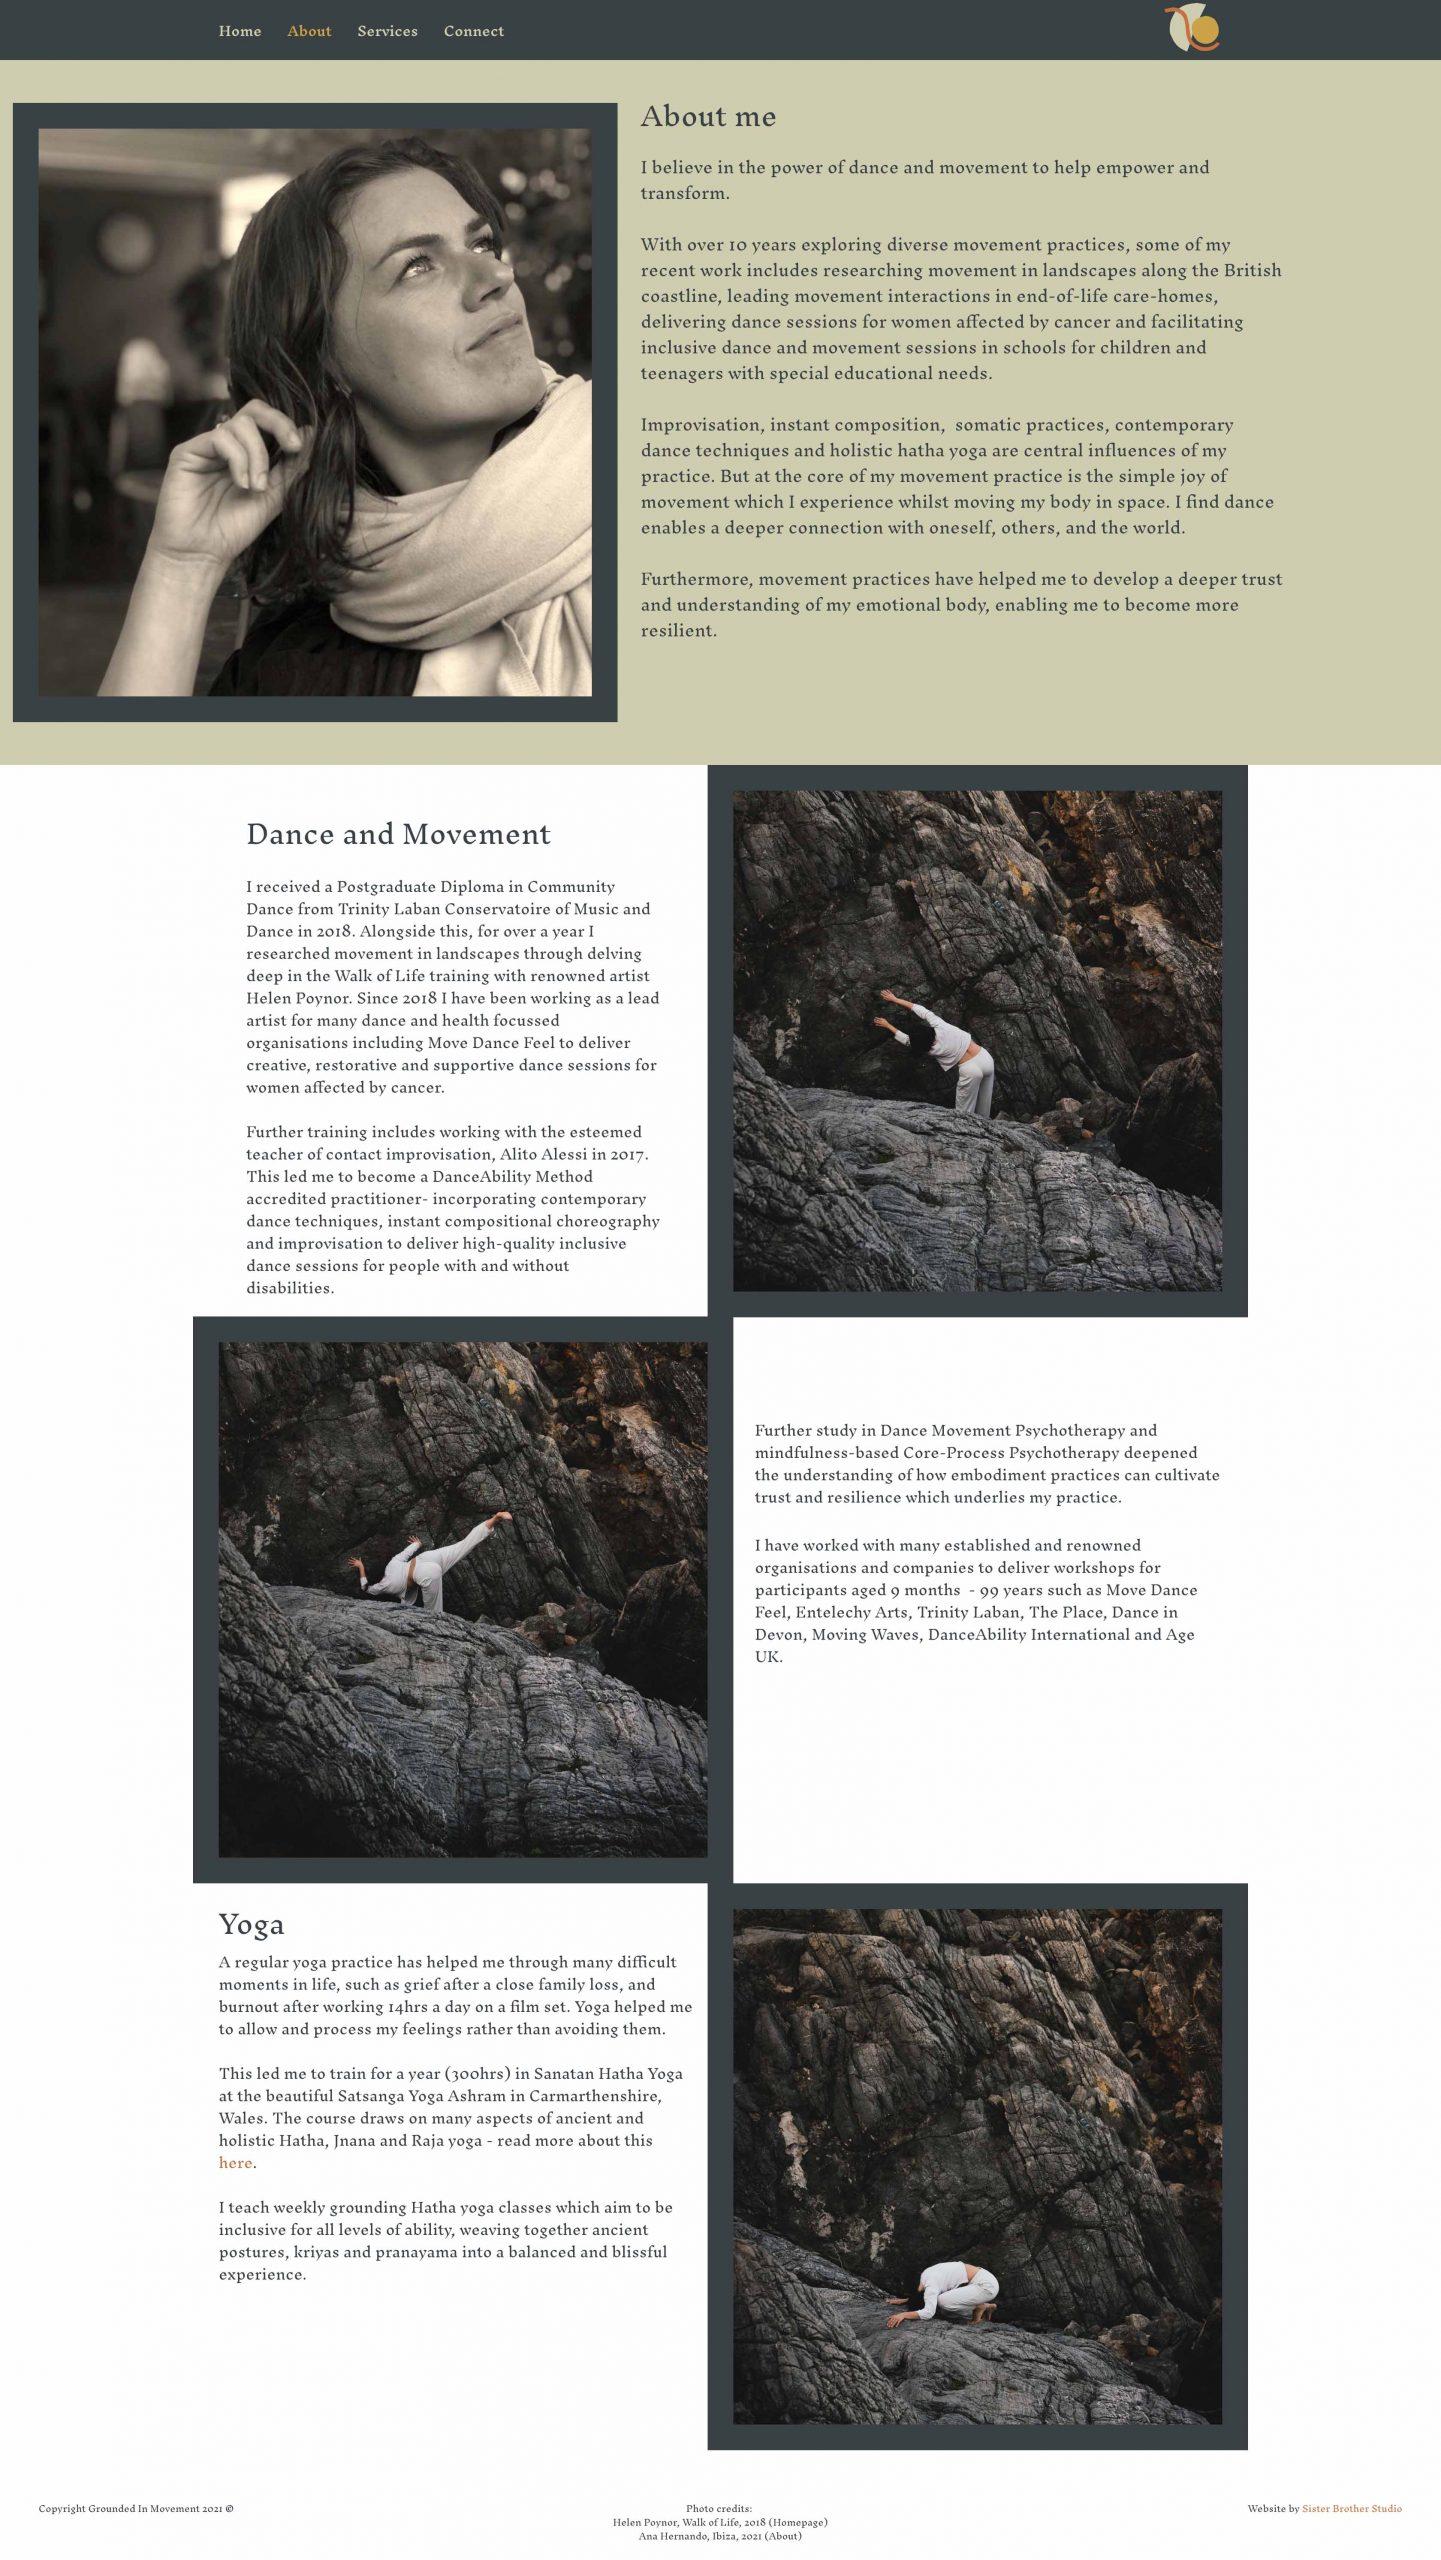 screencapture-groundedinmovement-co-about-2021-06-28-14_32_41